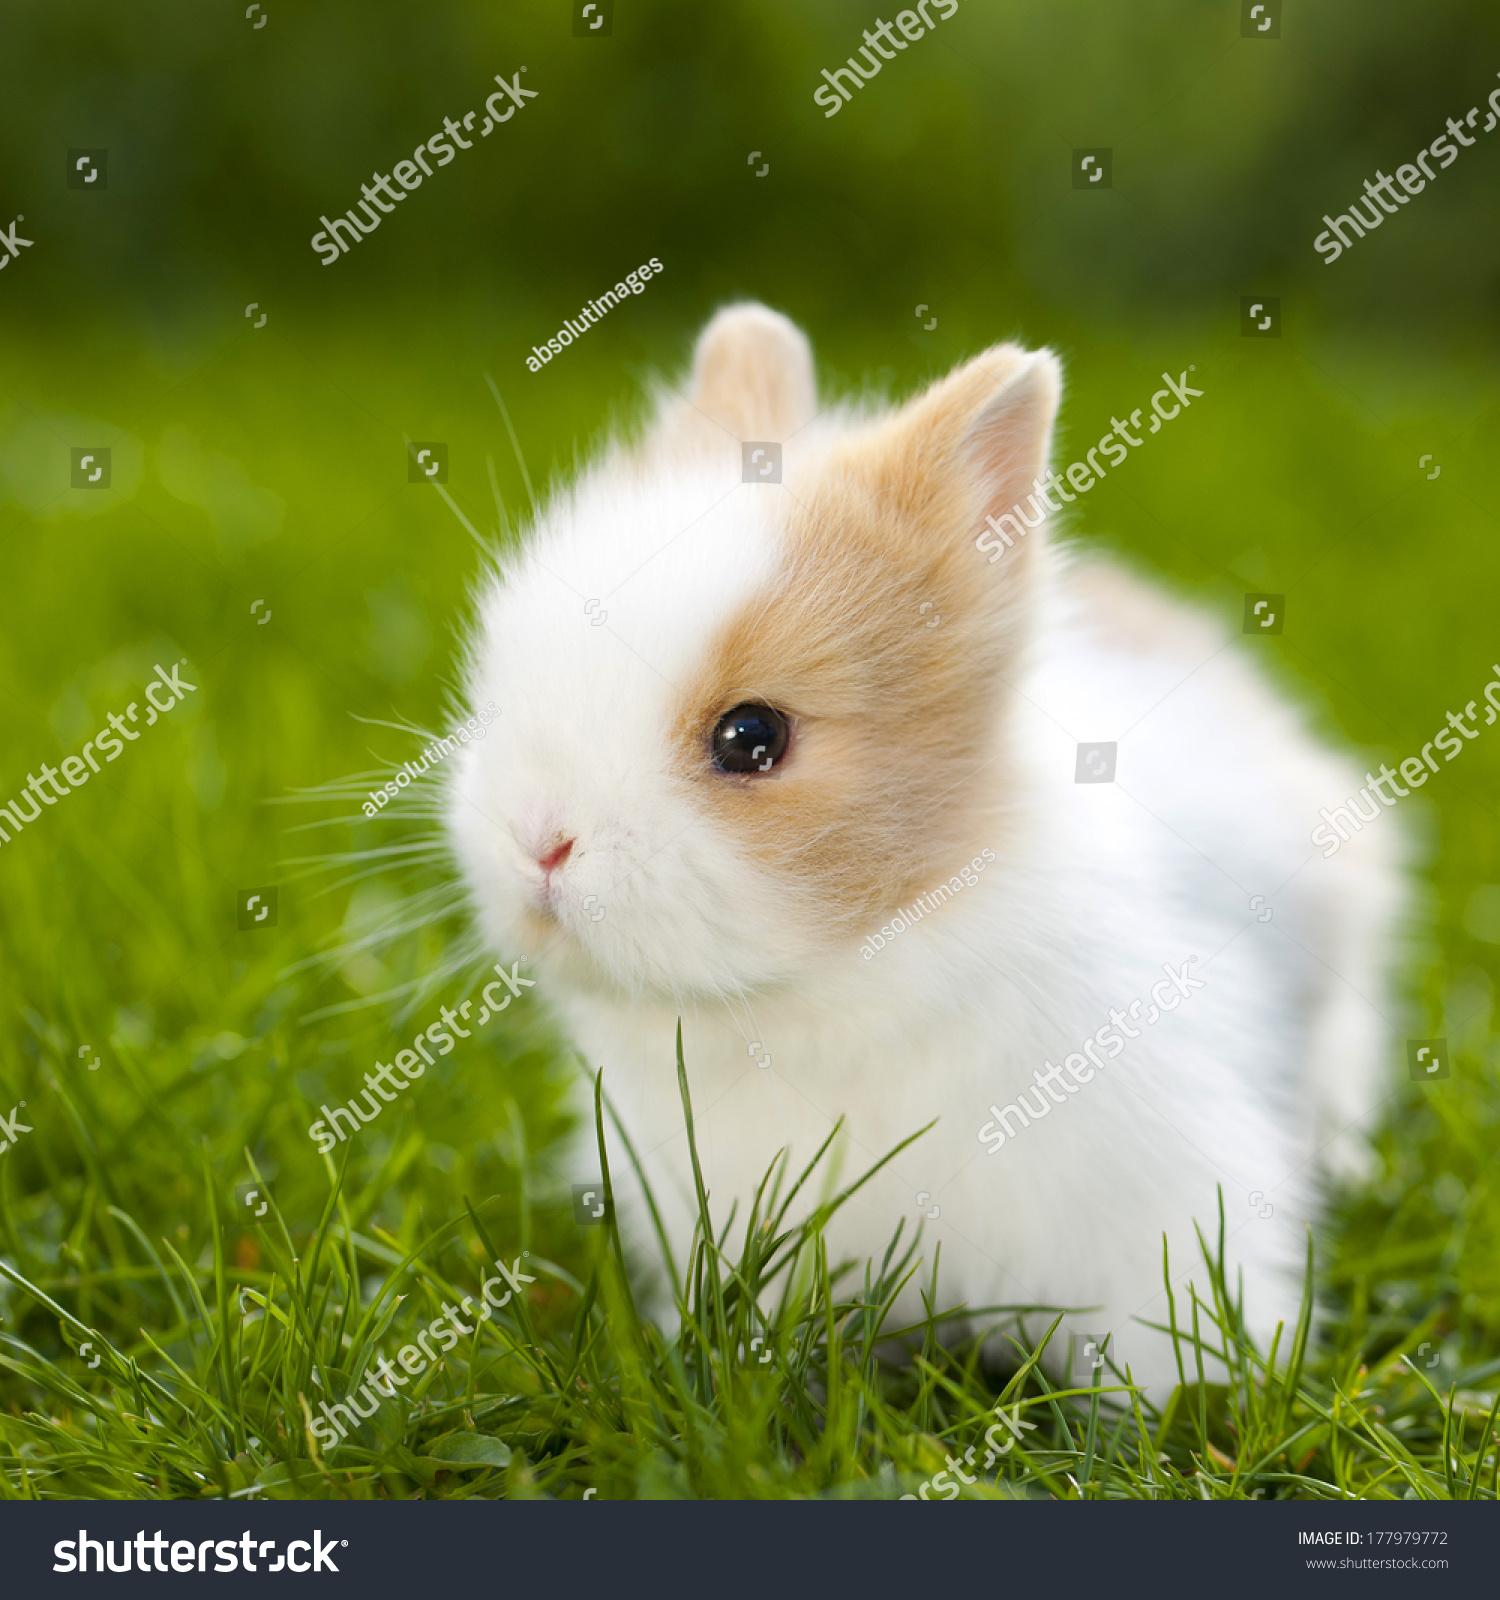 Baby Rabbit Sitting Grassland Stock Photo